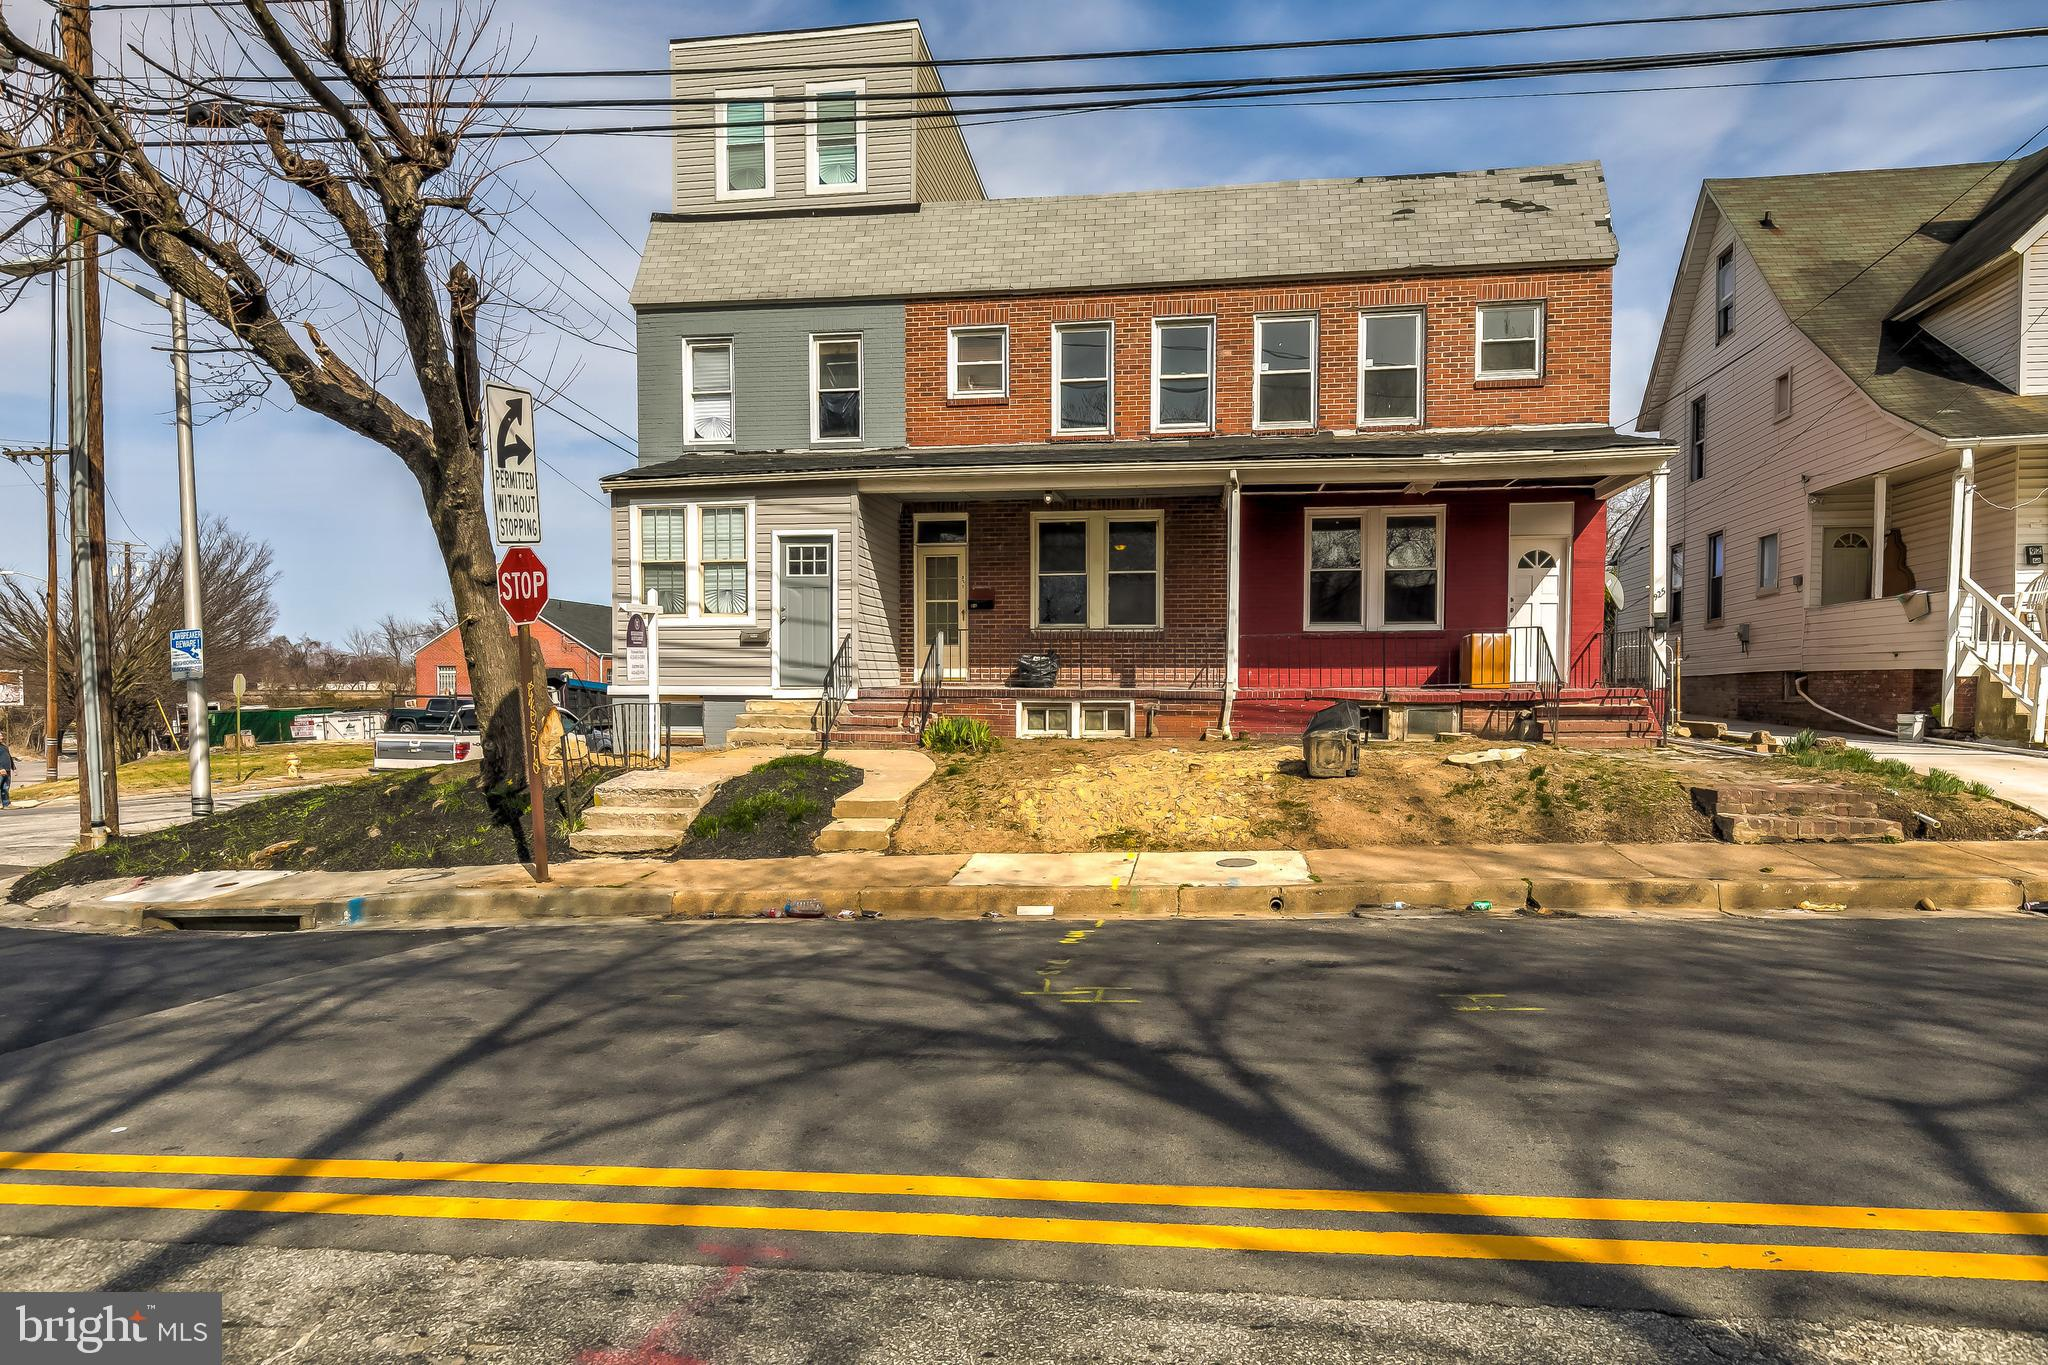 929 N Kresson Street, Baltimore, MD 21205